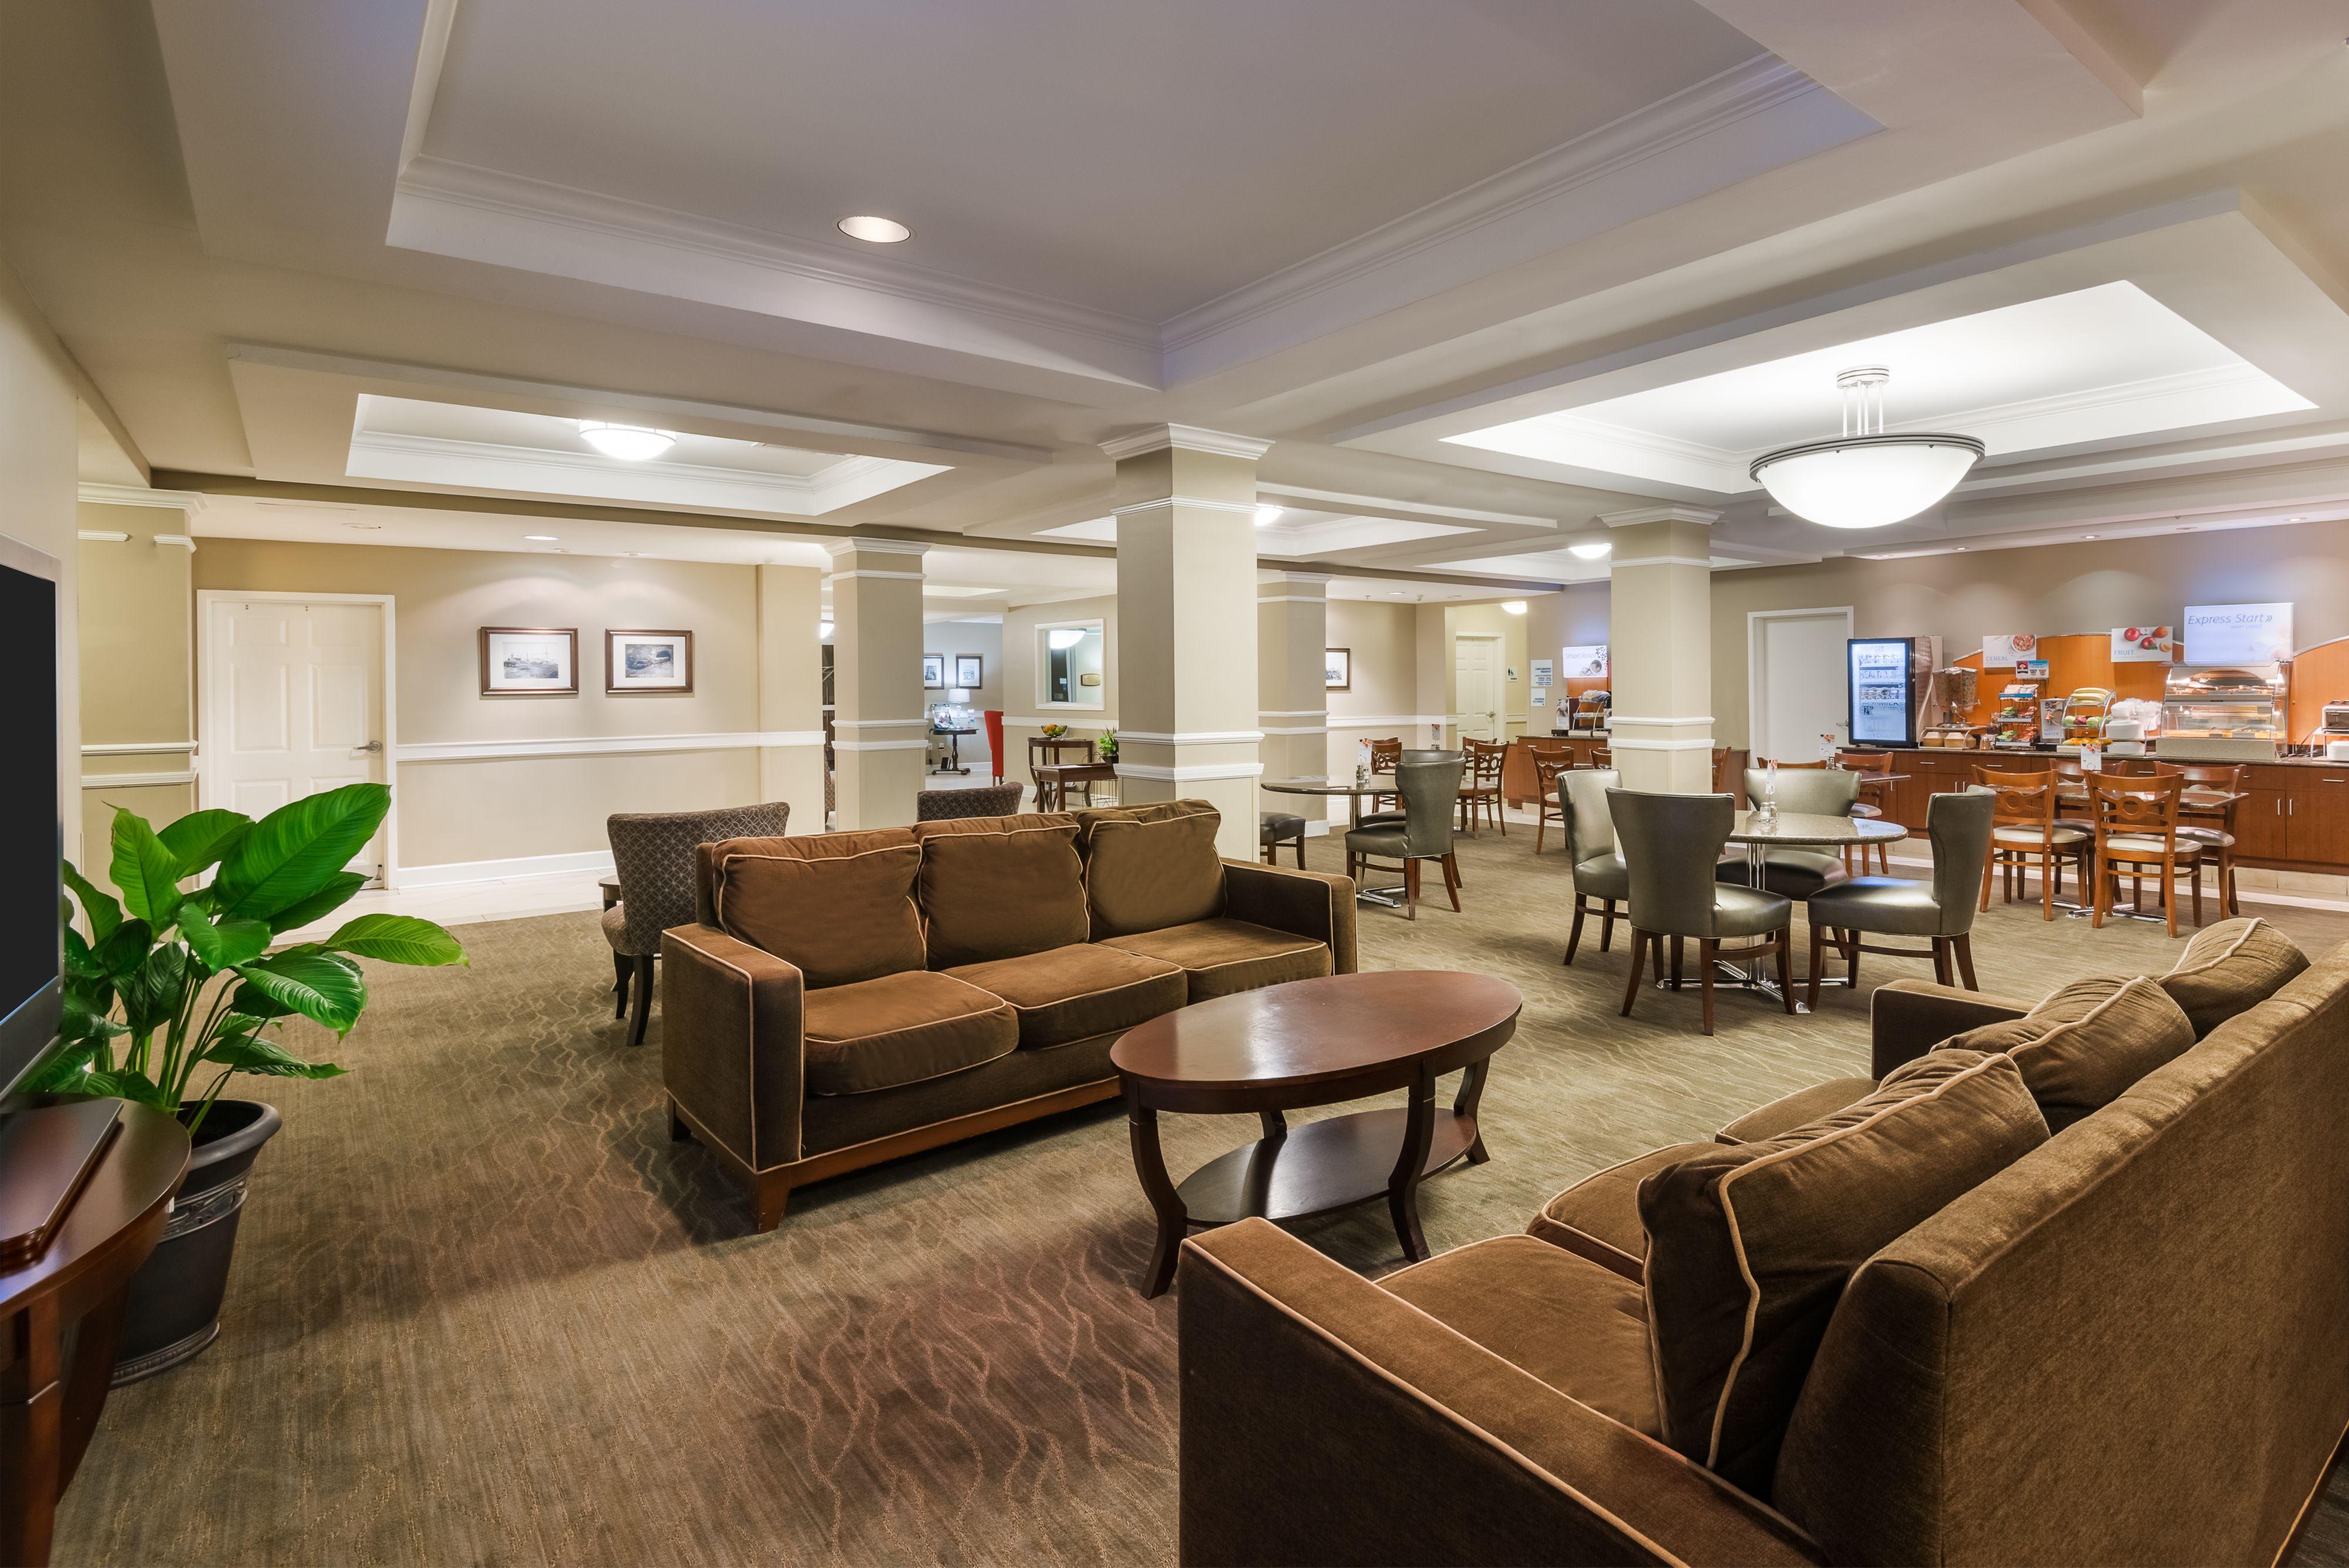 Holiday Inn Express & Suites New Iberia-Avery Island image 4